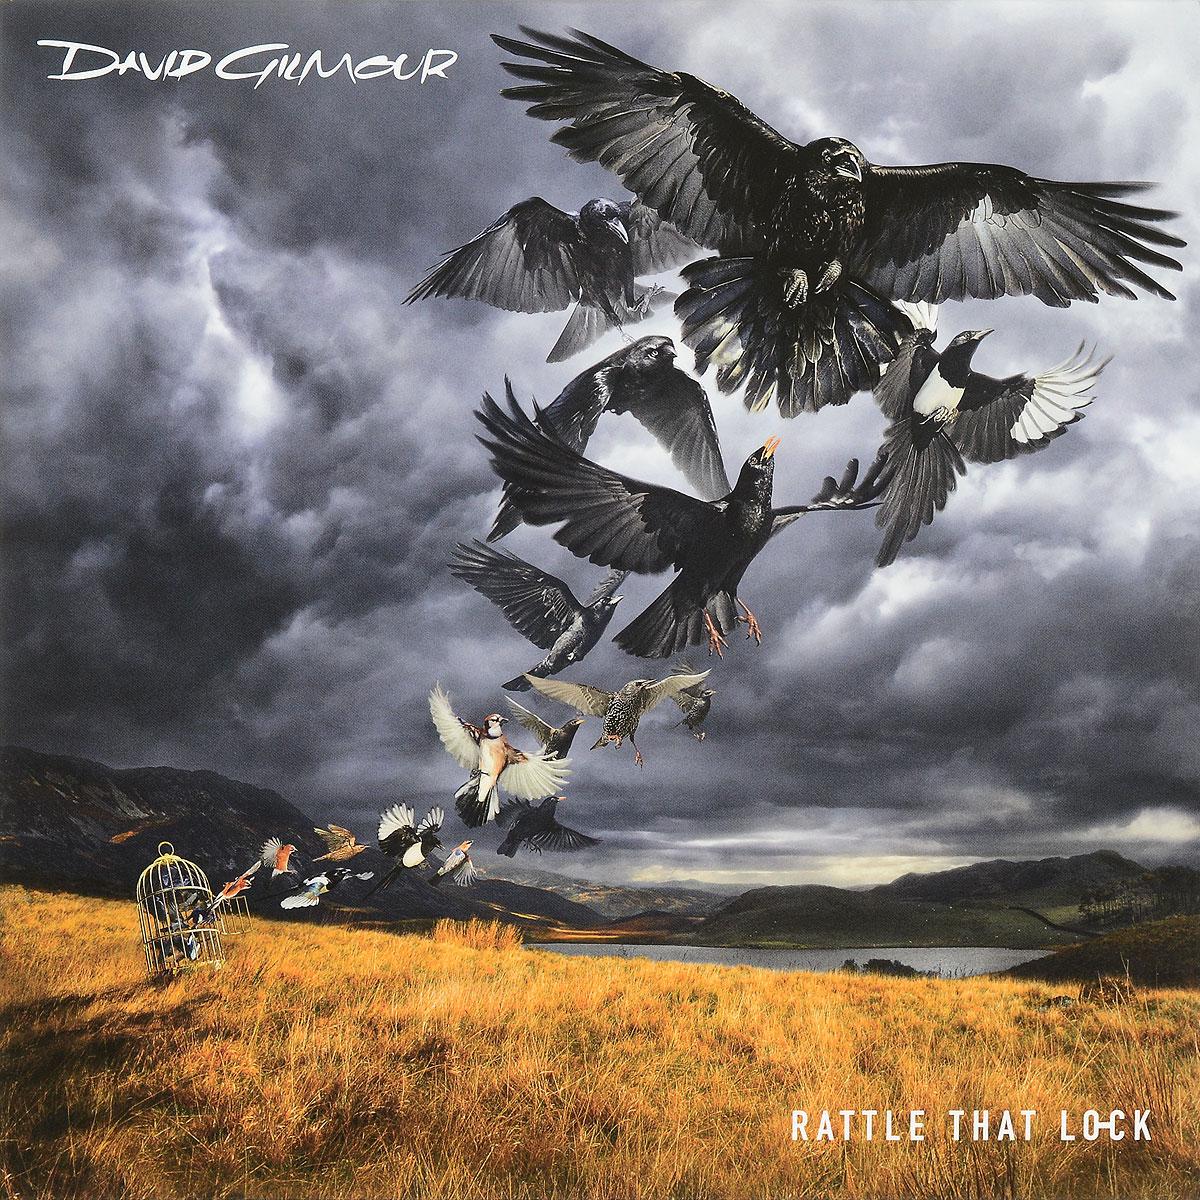 Дэвид Гилмор David Gilmour. Rattle That Lock (LP) cd david gilmour rattle that lock